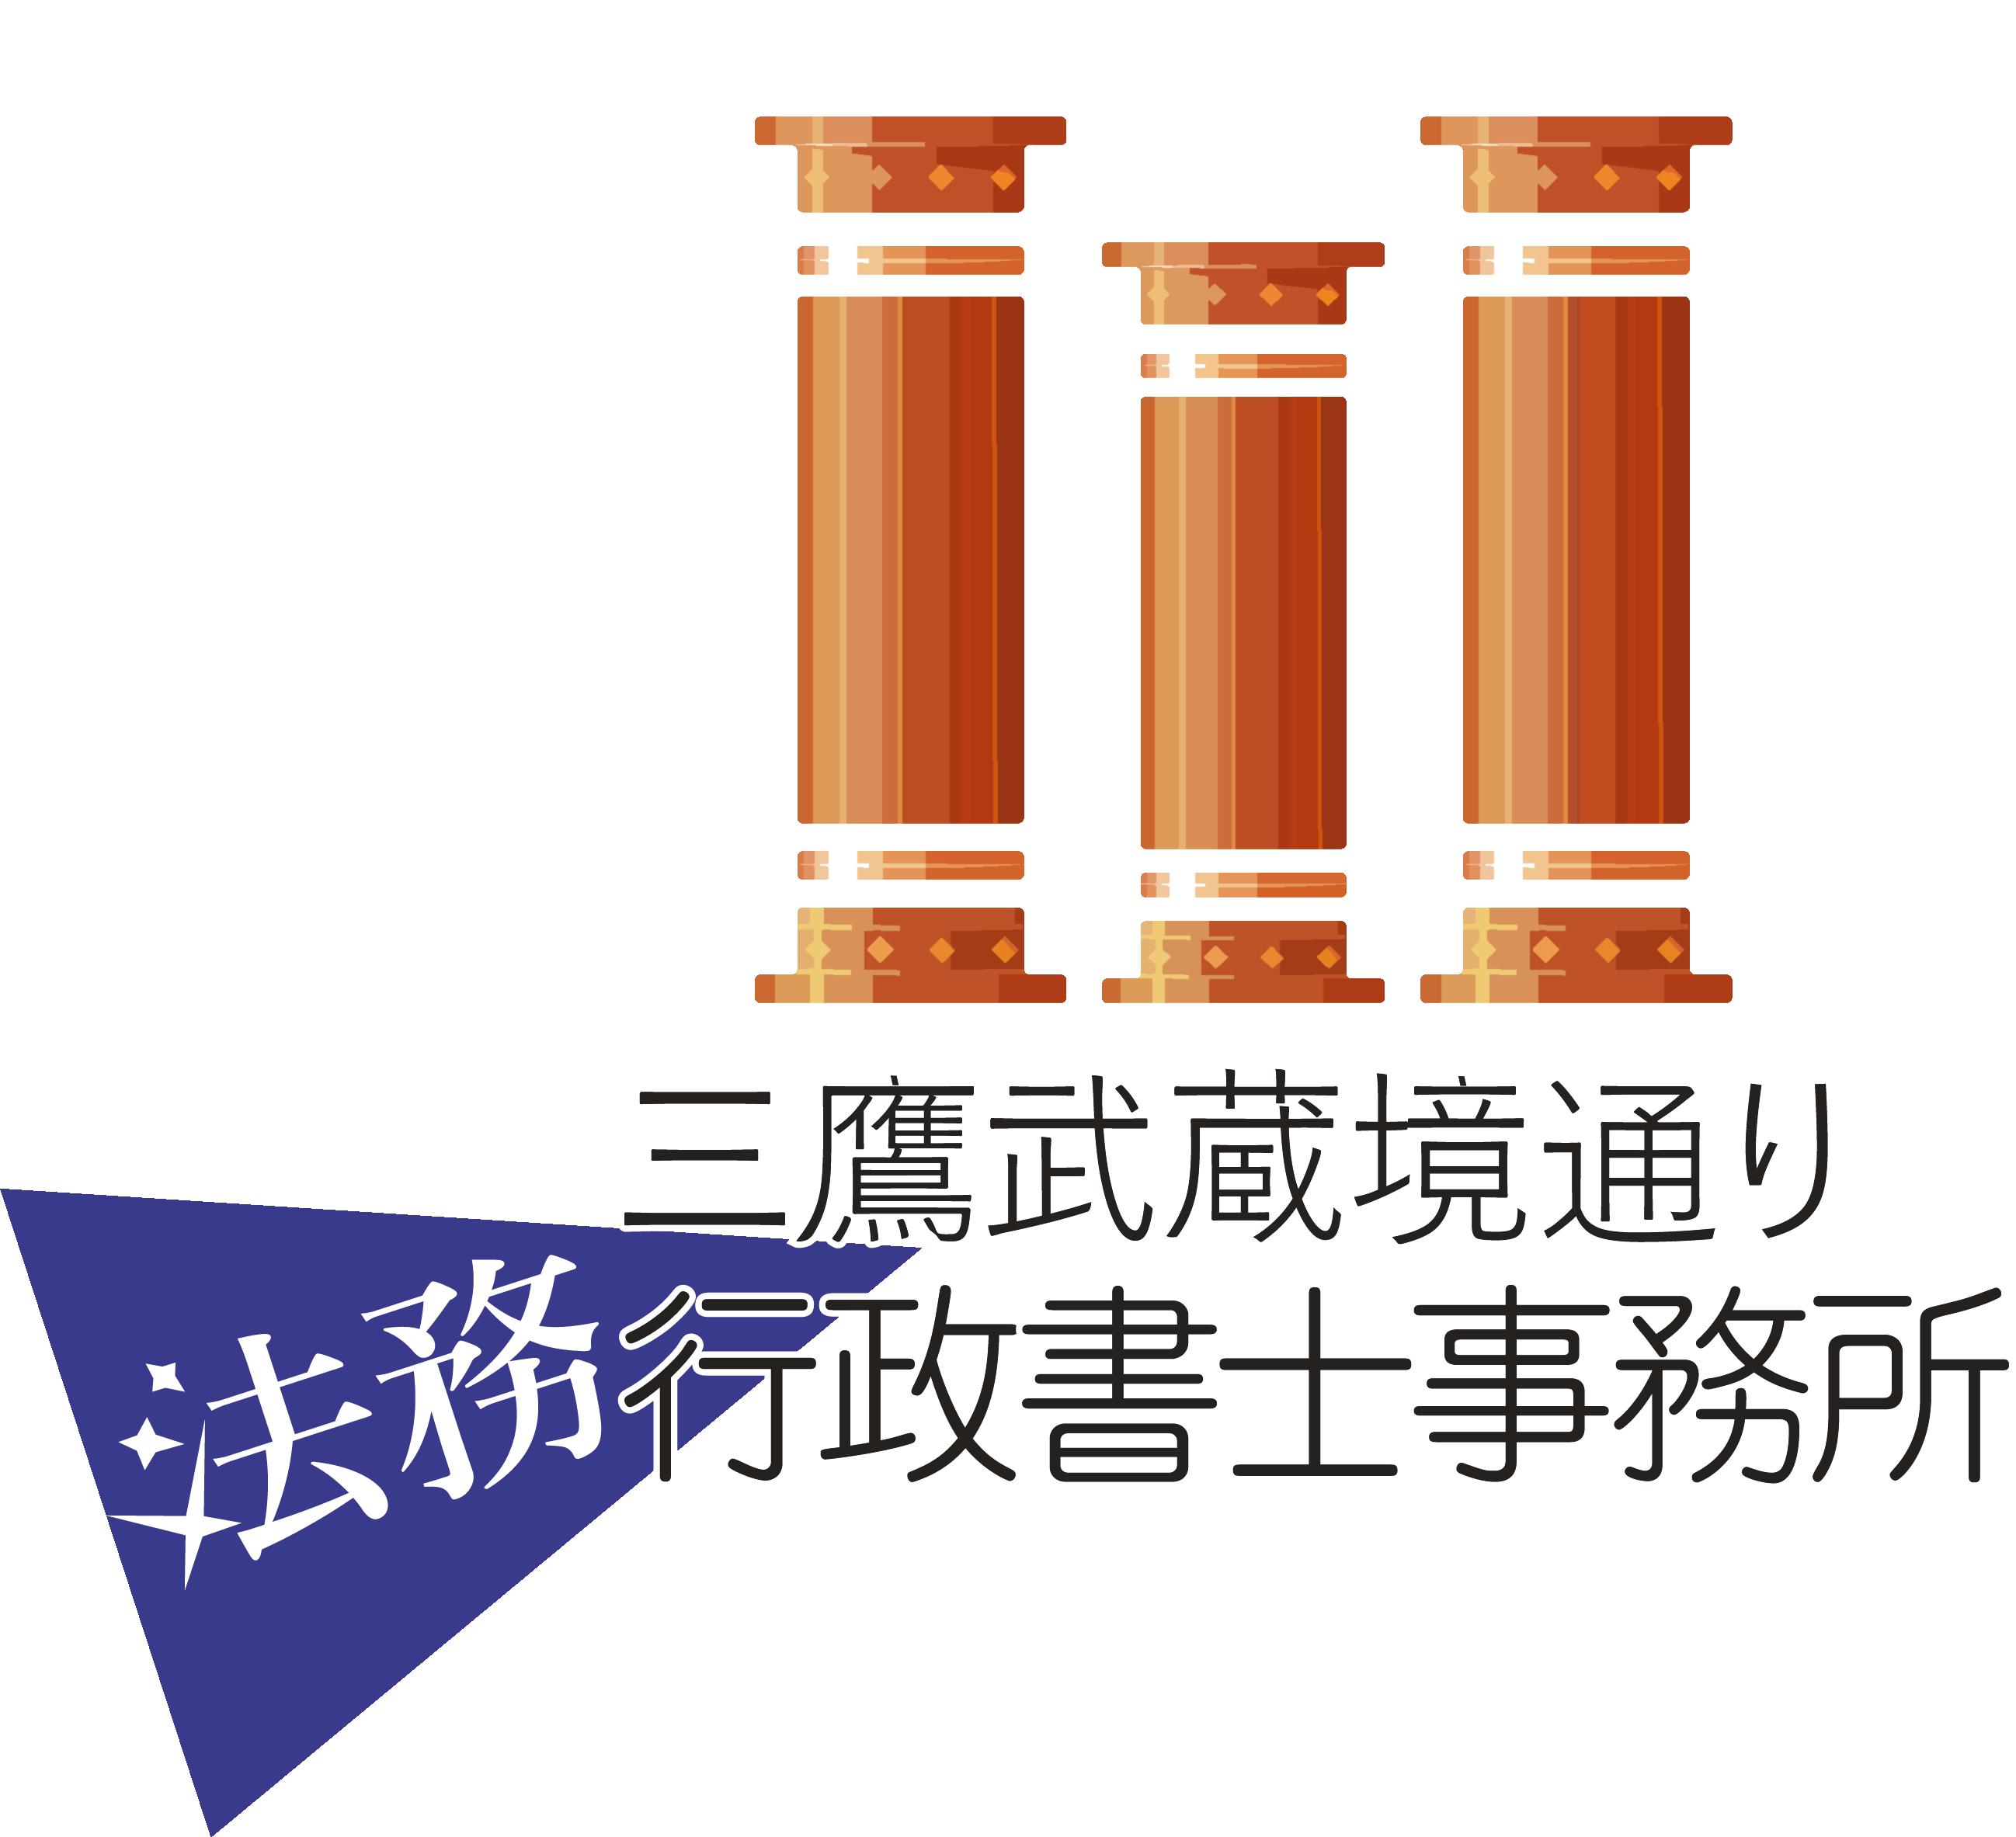 MM_logo_p